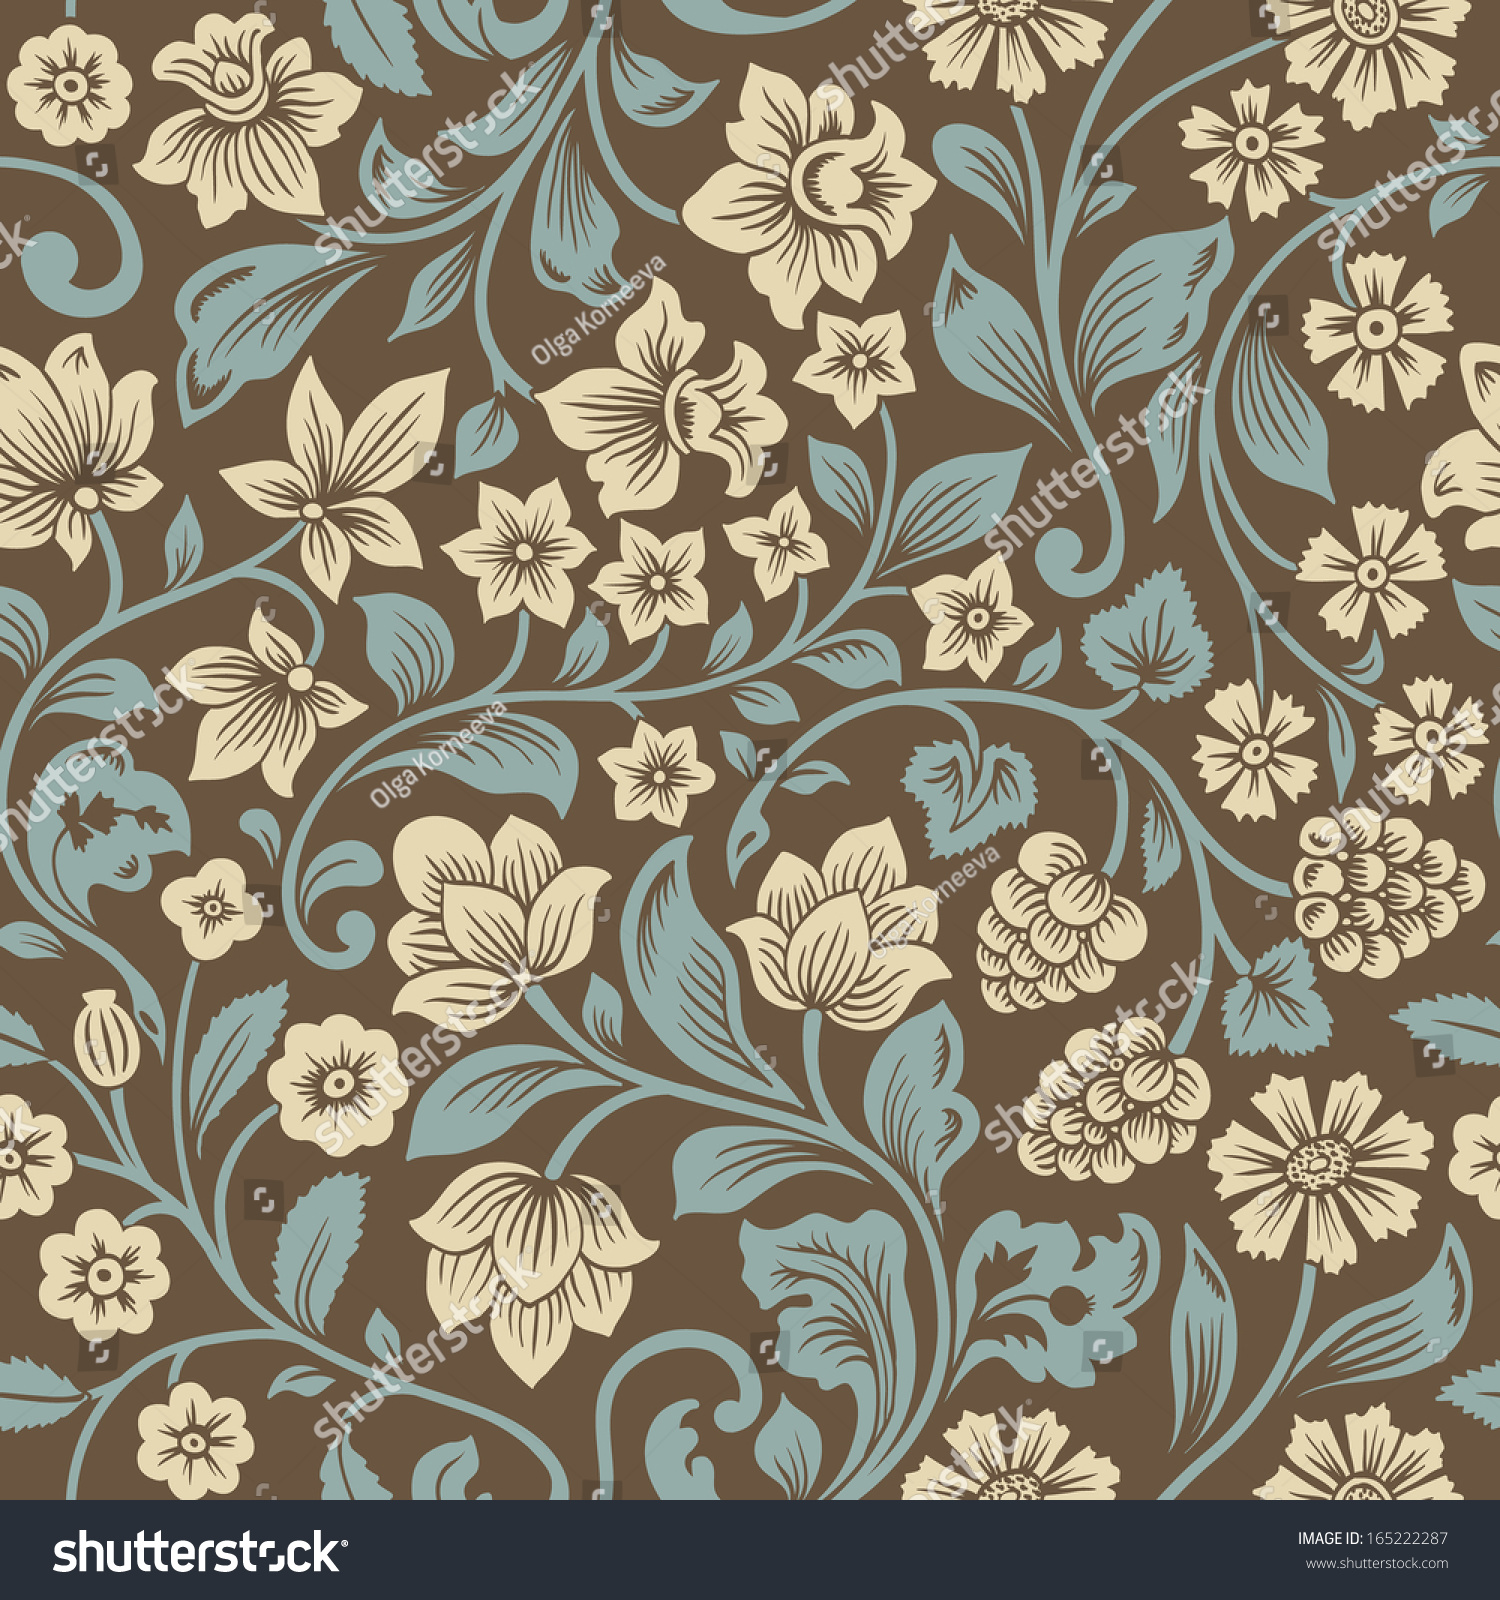 Vintage Floral Seamless Pattern Stock Illustration